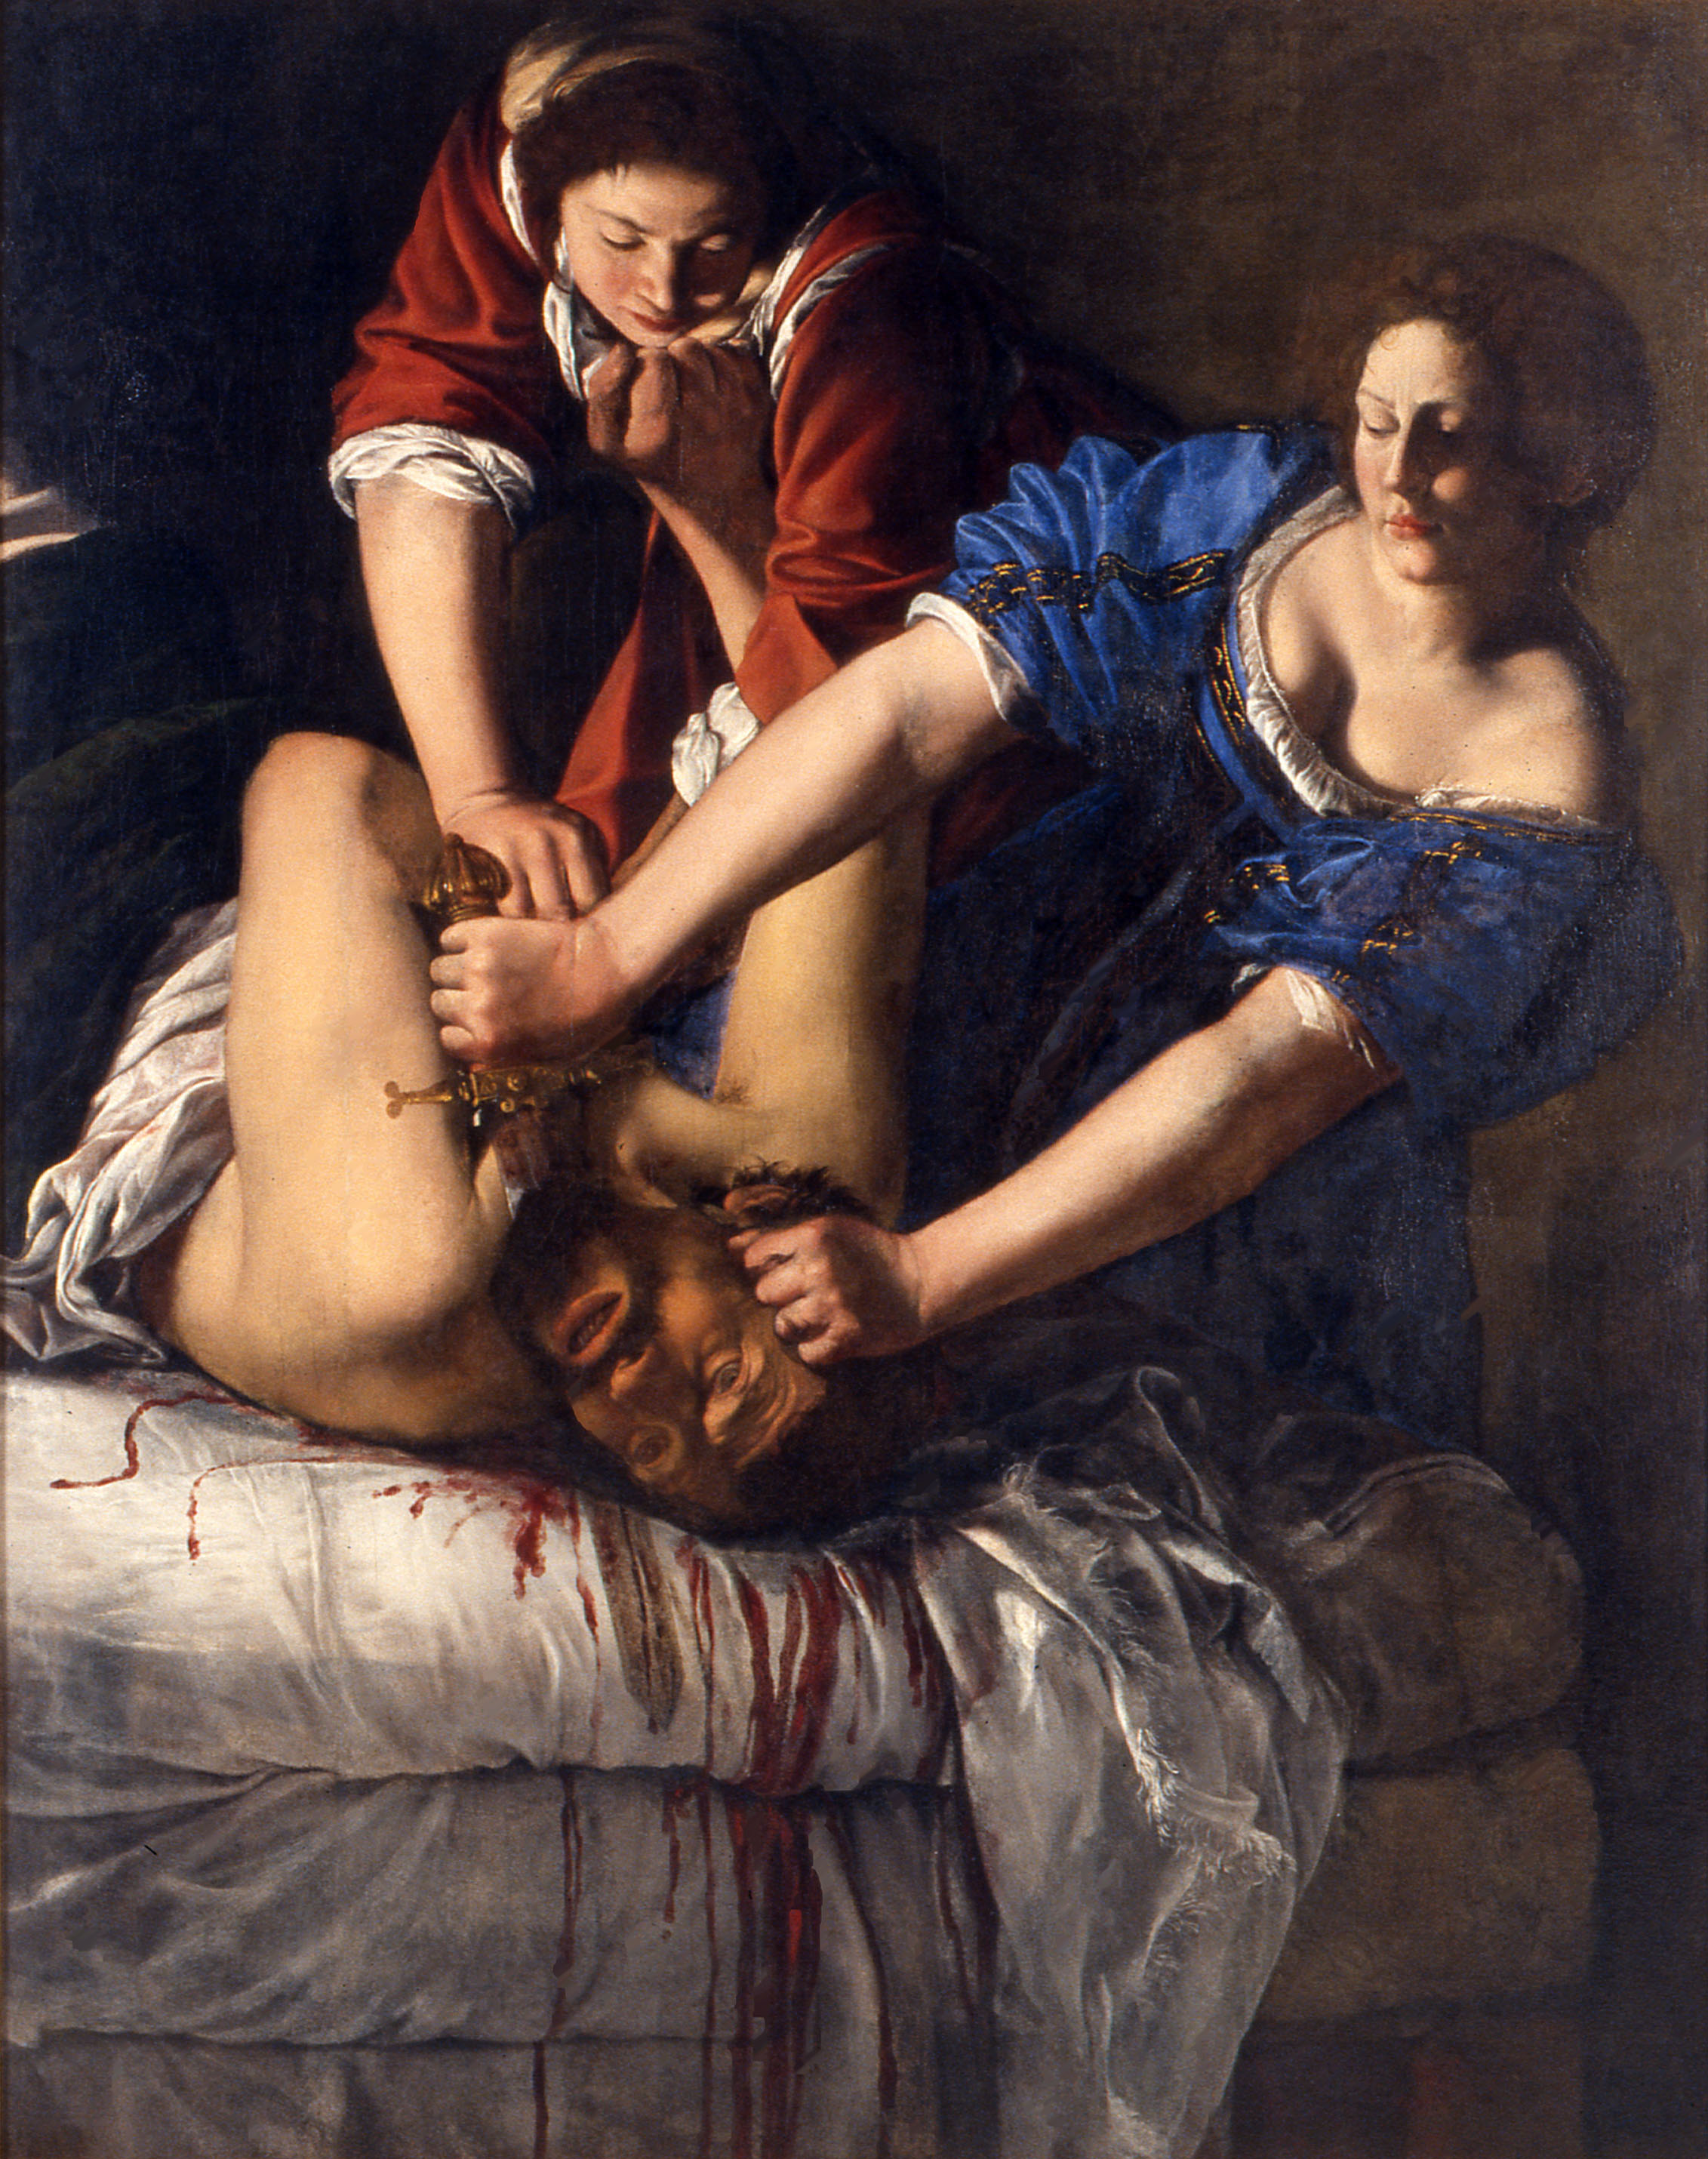 'Judit y Holofernes' de Artemisia Gentileschi (1613). M. N. di Capodimonte, Nápoles